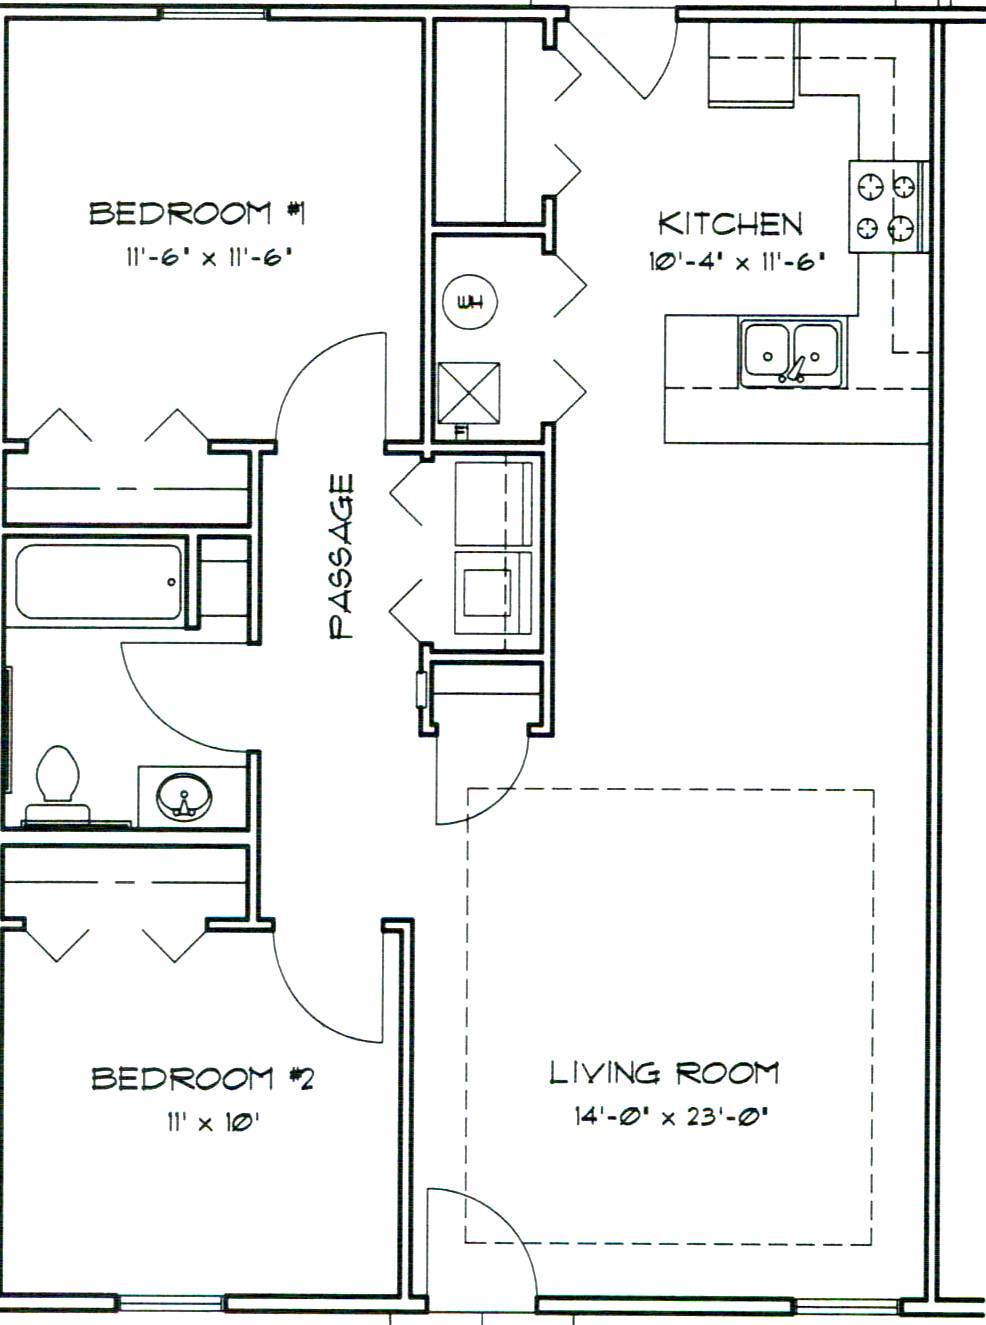 2 br layout.jpg